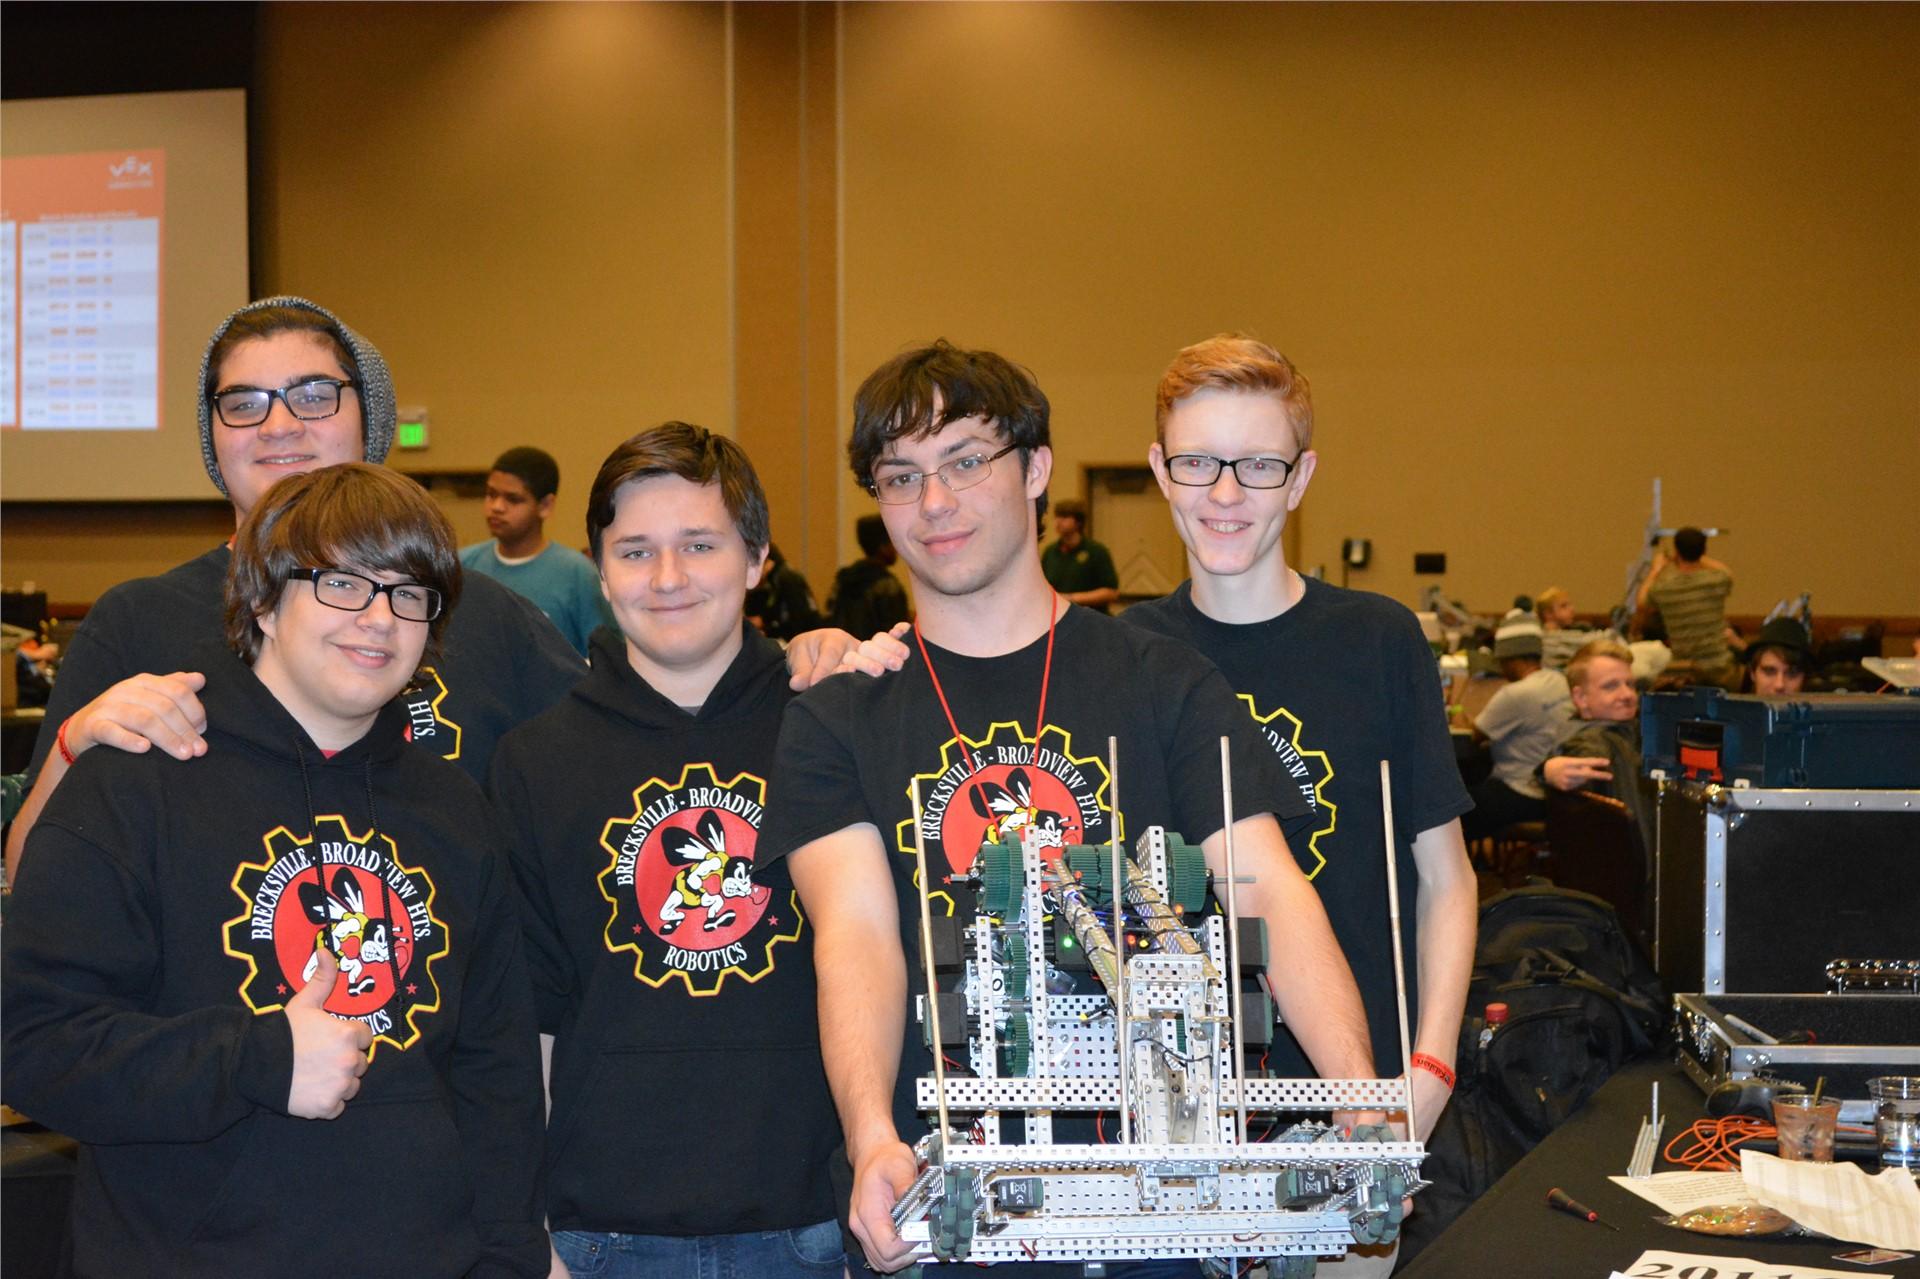 Robotics team in action!